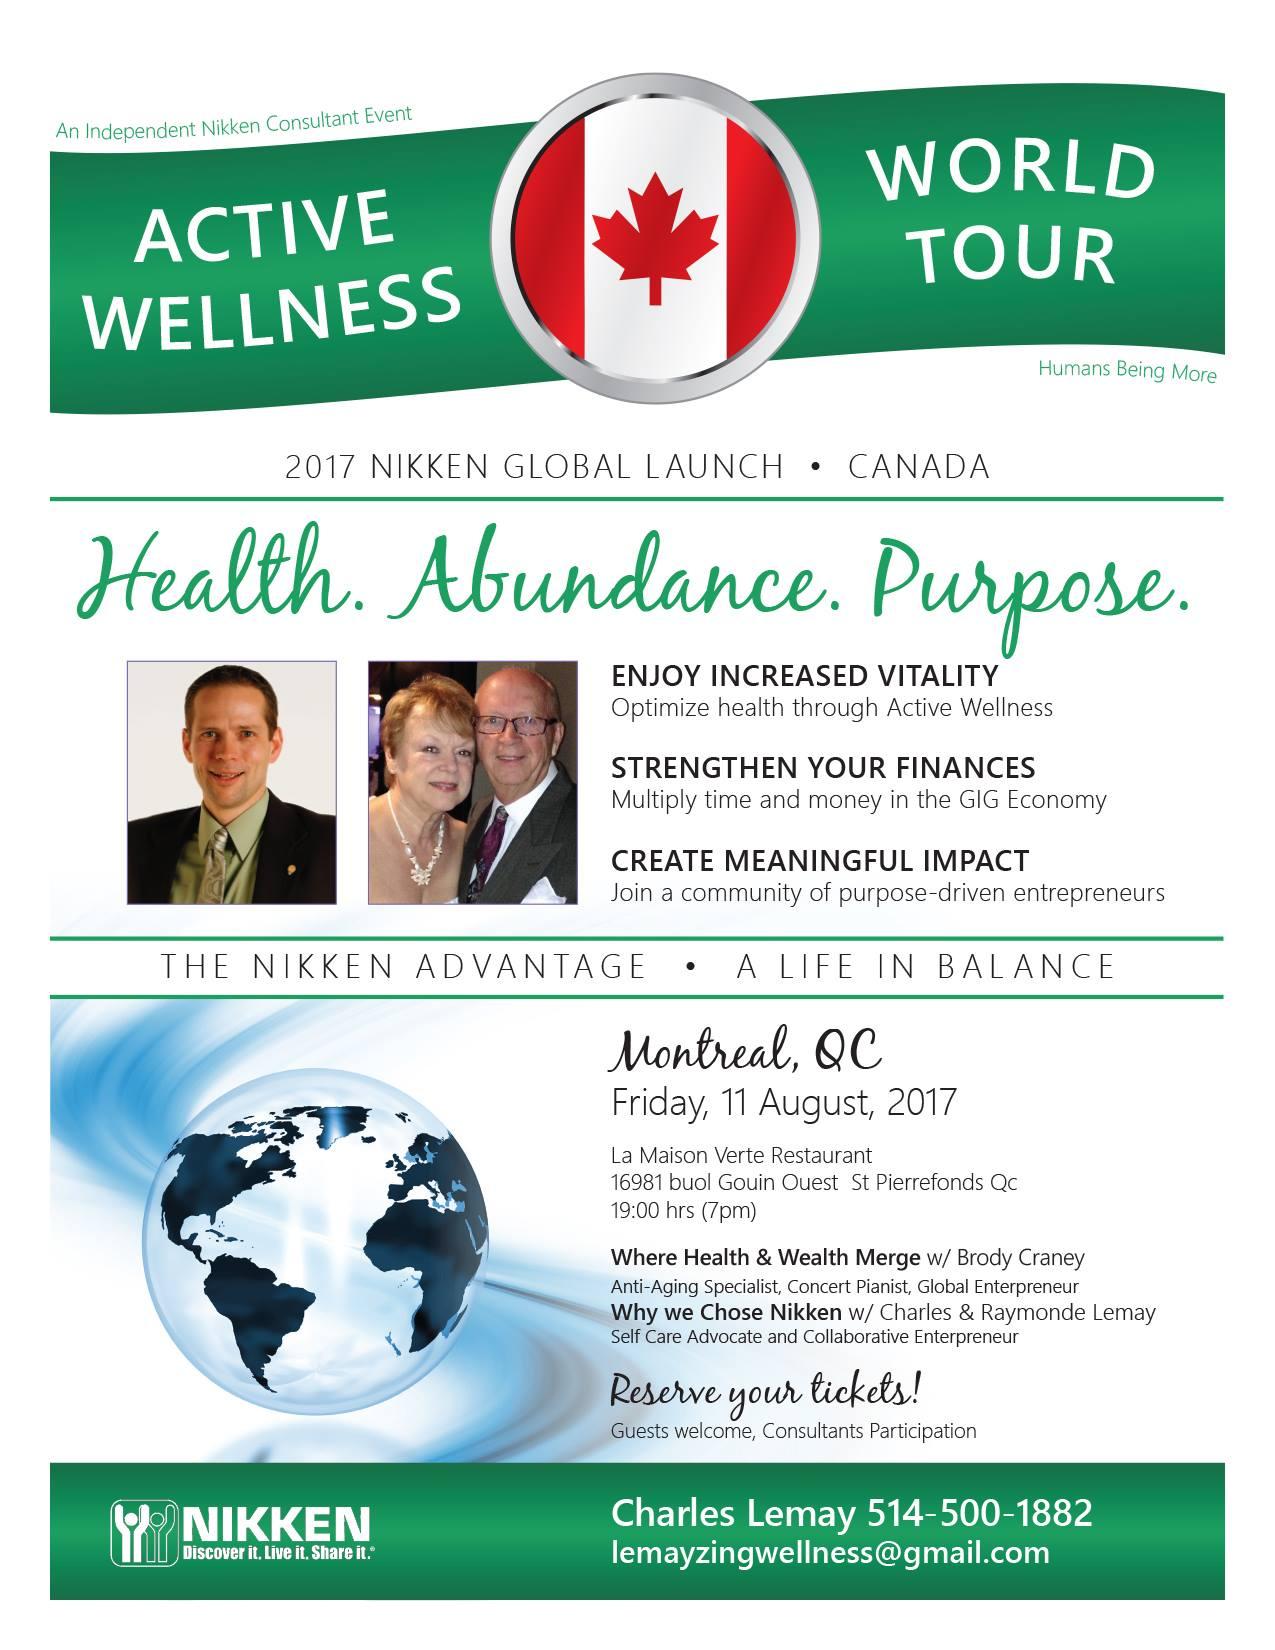 Montreal, QC. - Active Wellness Tour w/ Brody Craney & Charles & Raymonde Lemay @ La Maison Verte Restaurant | Montréal | Québec | Canada